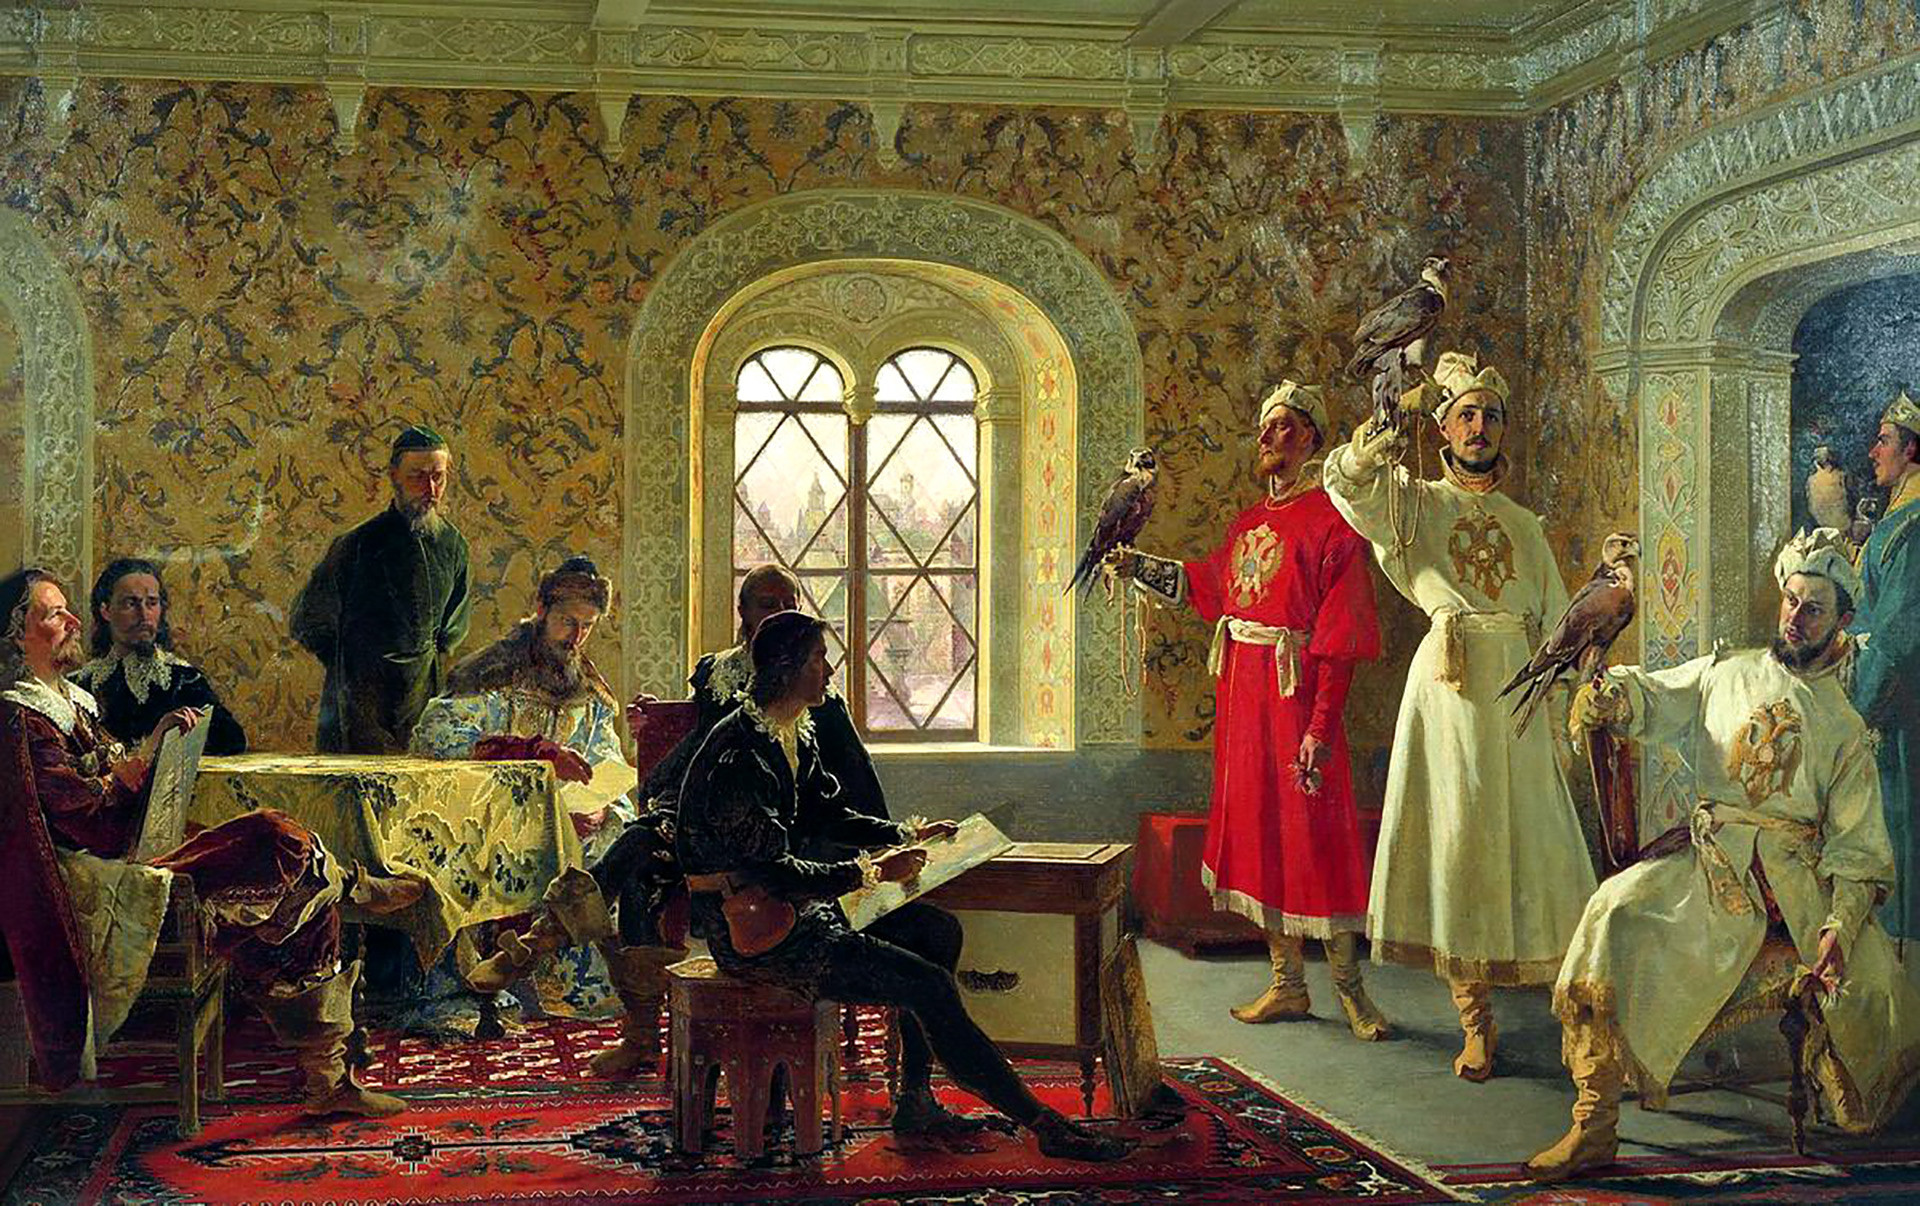 """Омиљени соколови цара Алексеја"", 1889, слика Александра Литовченка (1835-1890)."